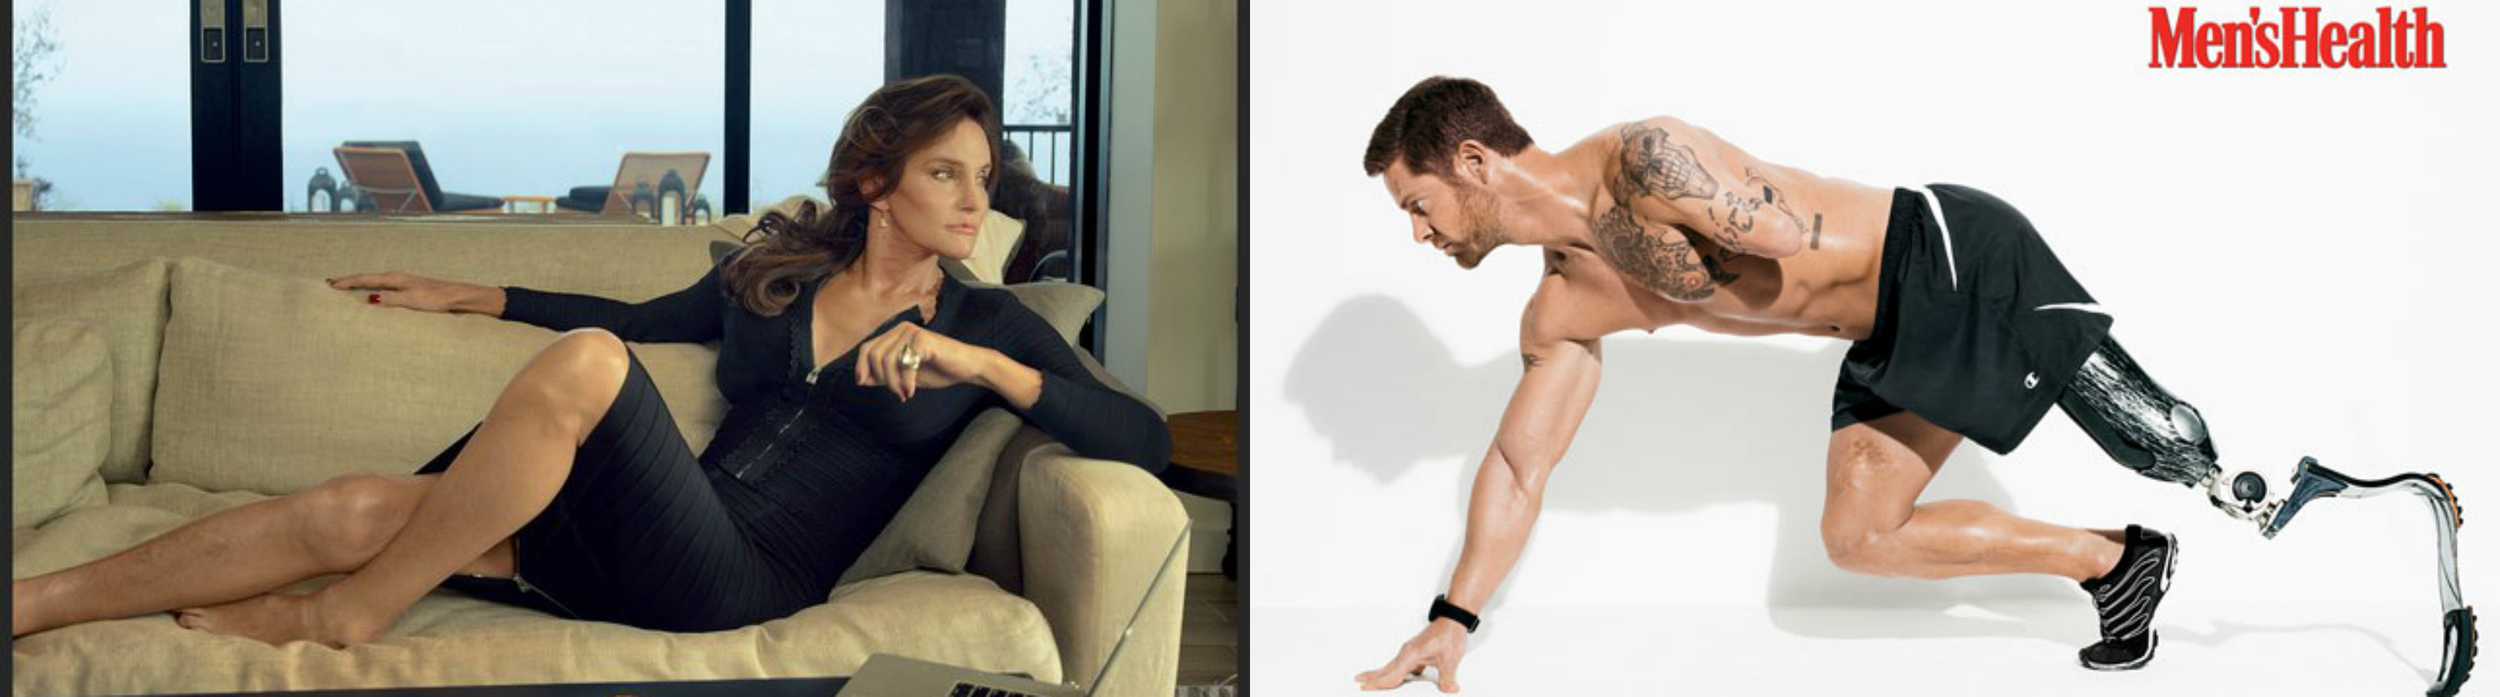 Photos courtesy of Vanity Fair and Men's Health